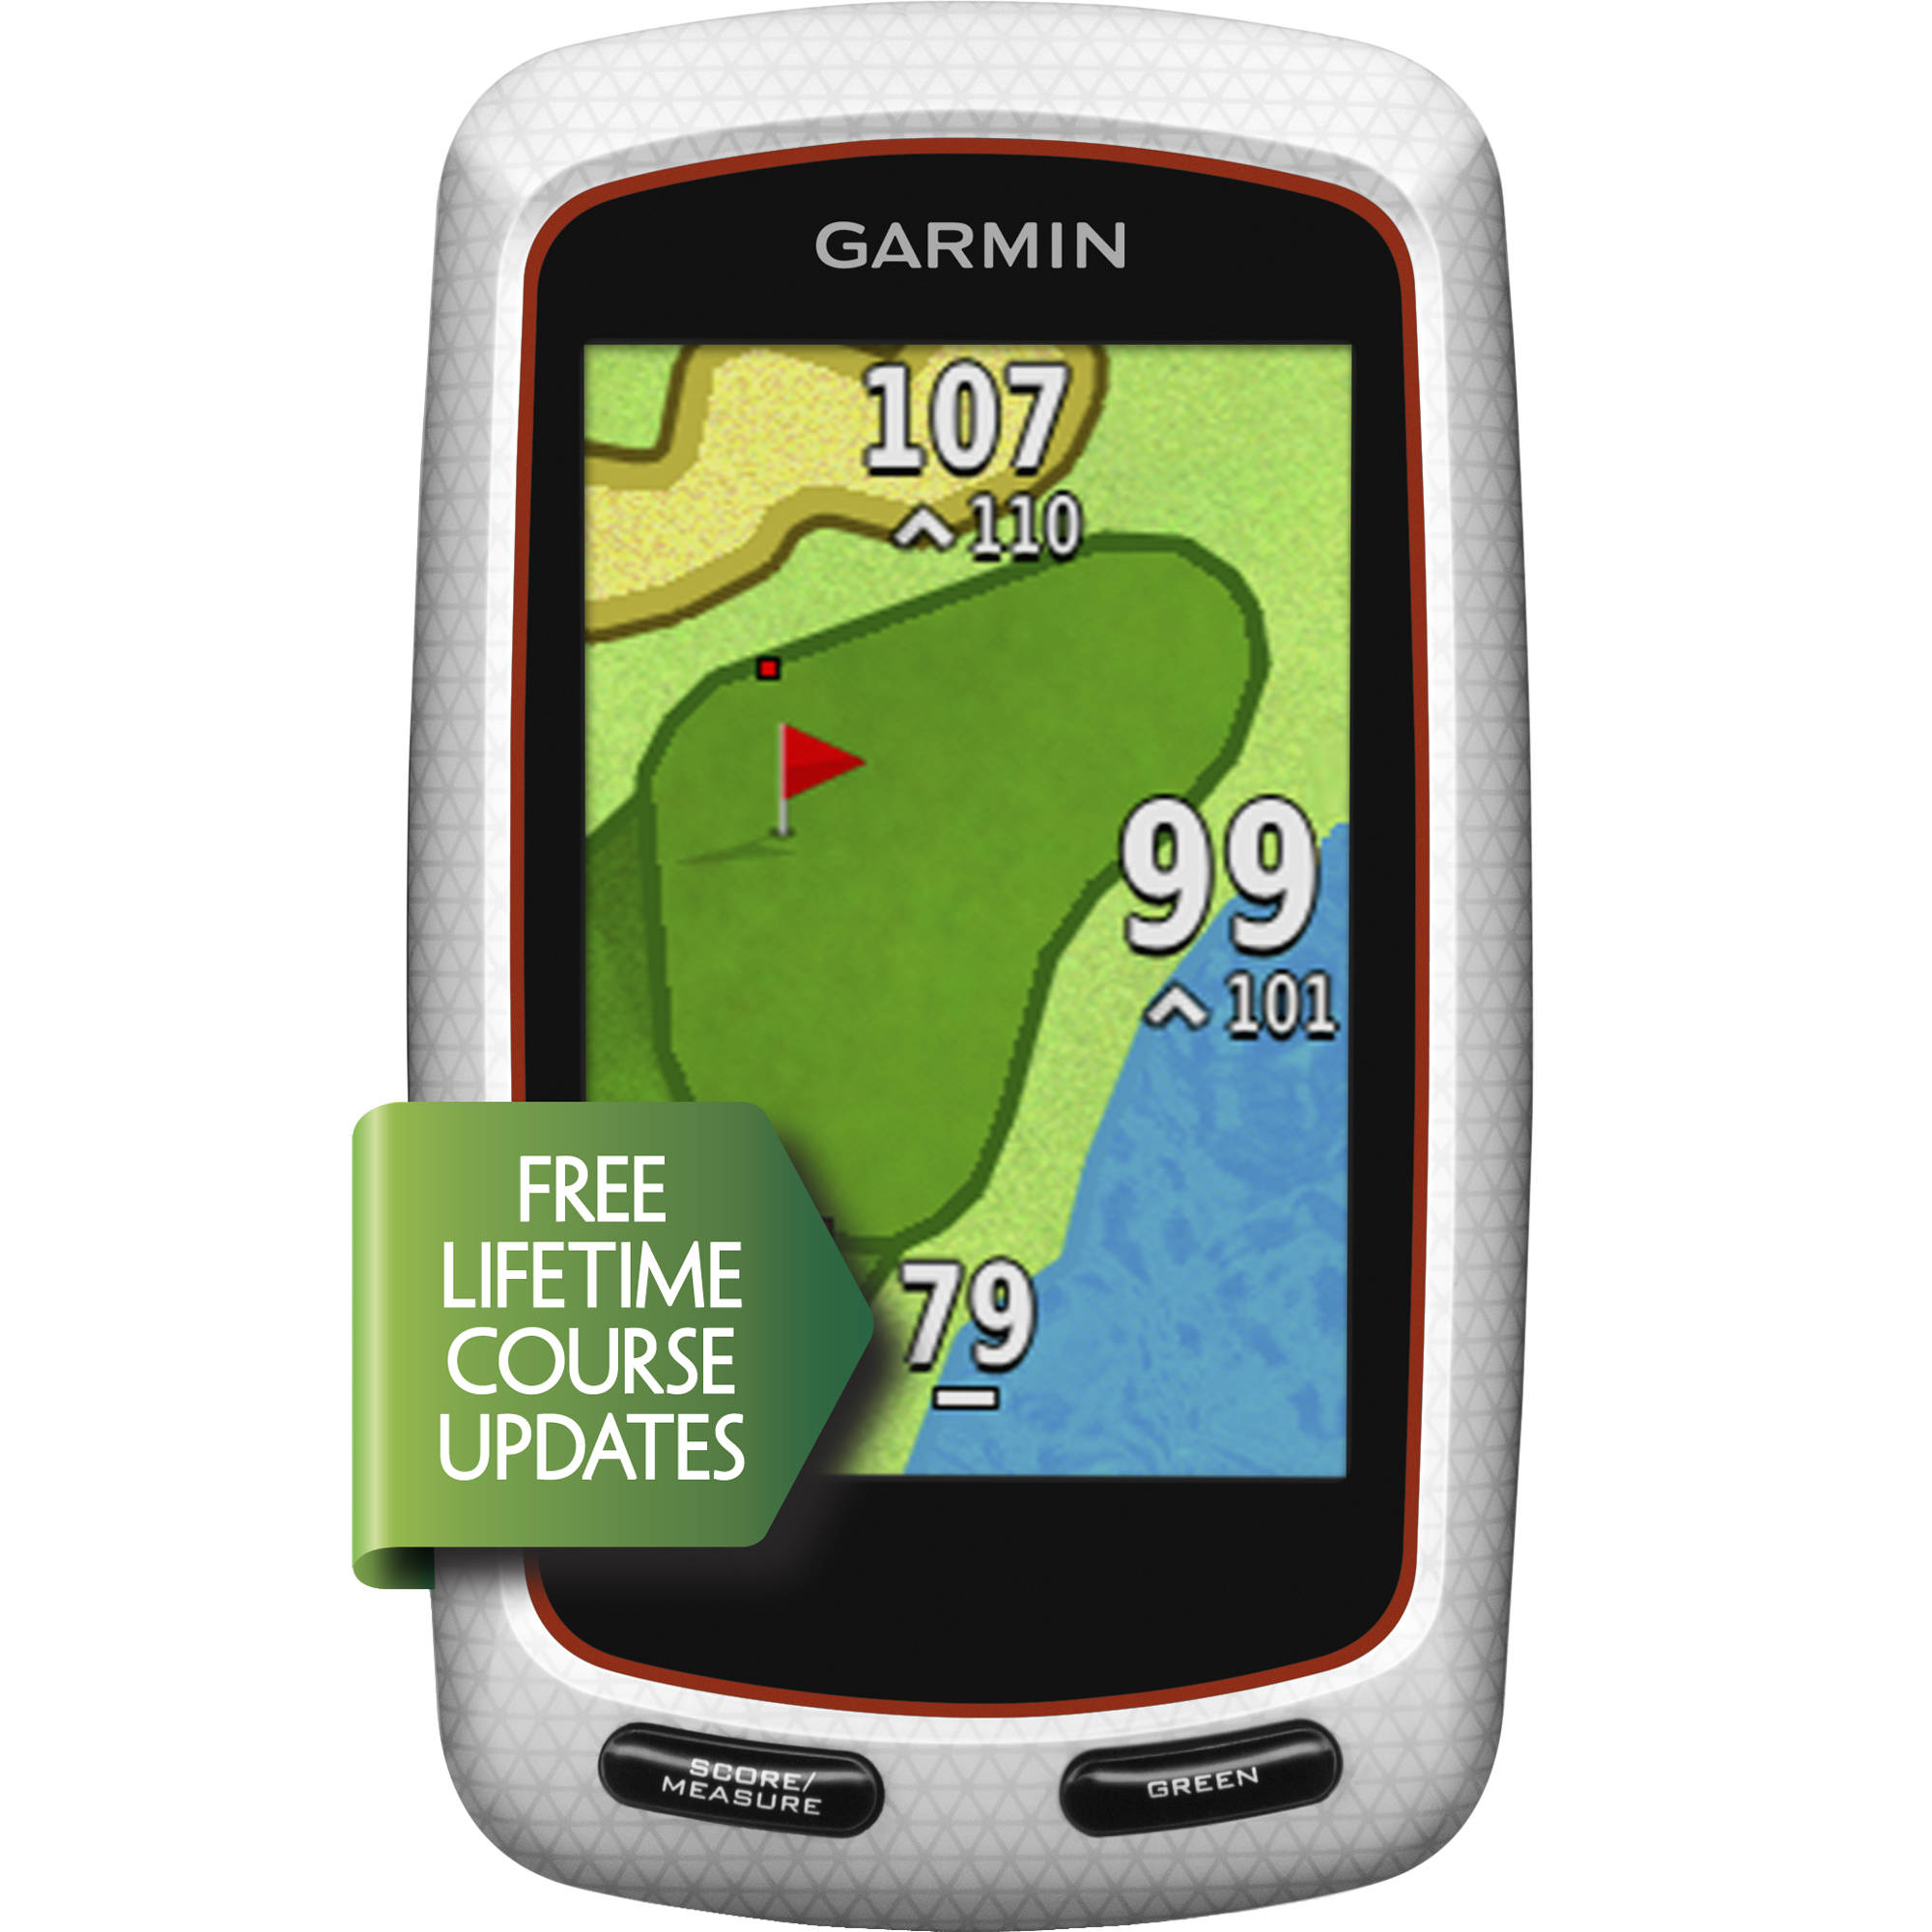 garmin golf gps g7 reviews